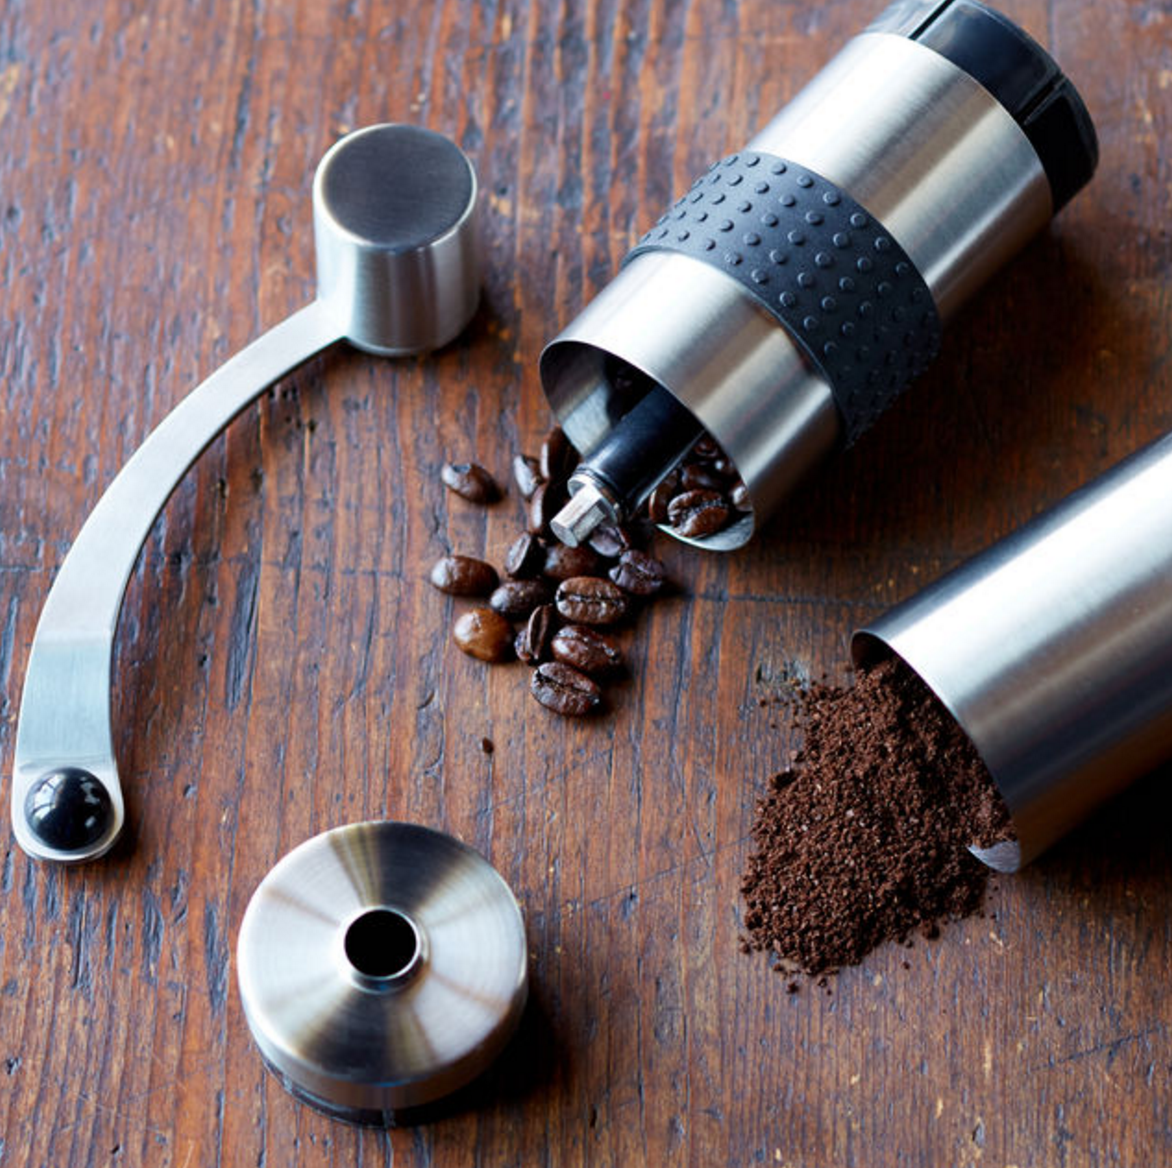 Rhinowares Compact Hand Coffee Grinder